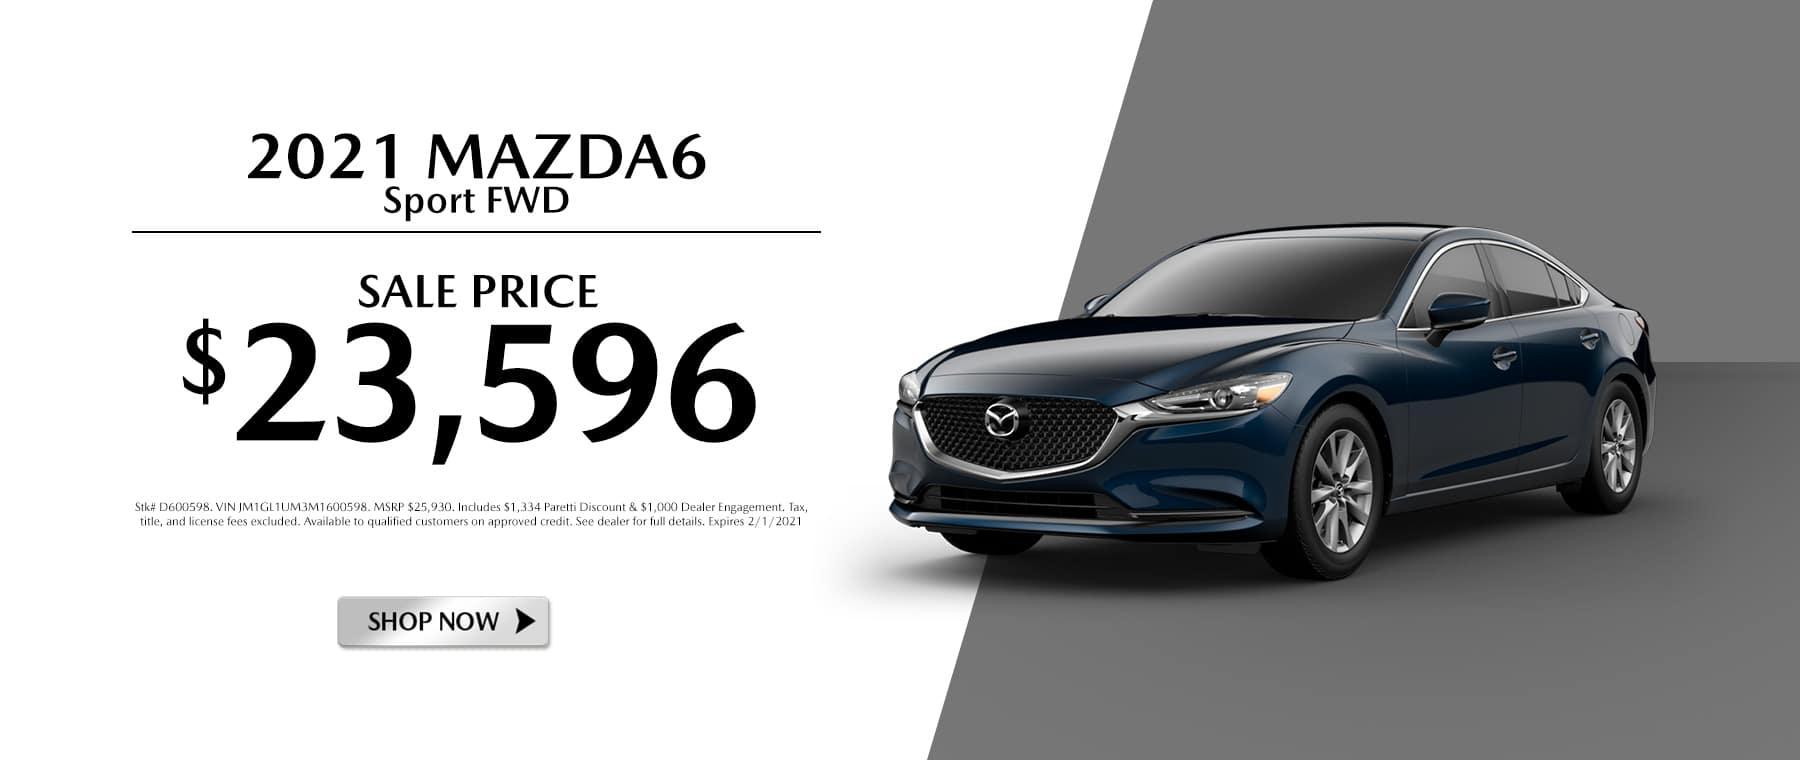 ParettiMazda_1800x760_1-21_Mazda65